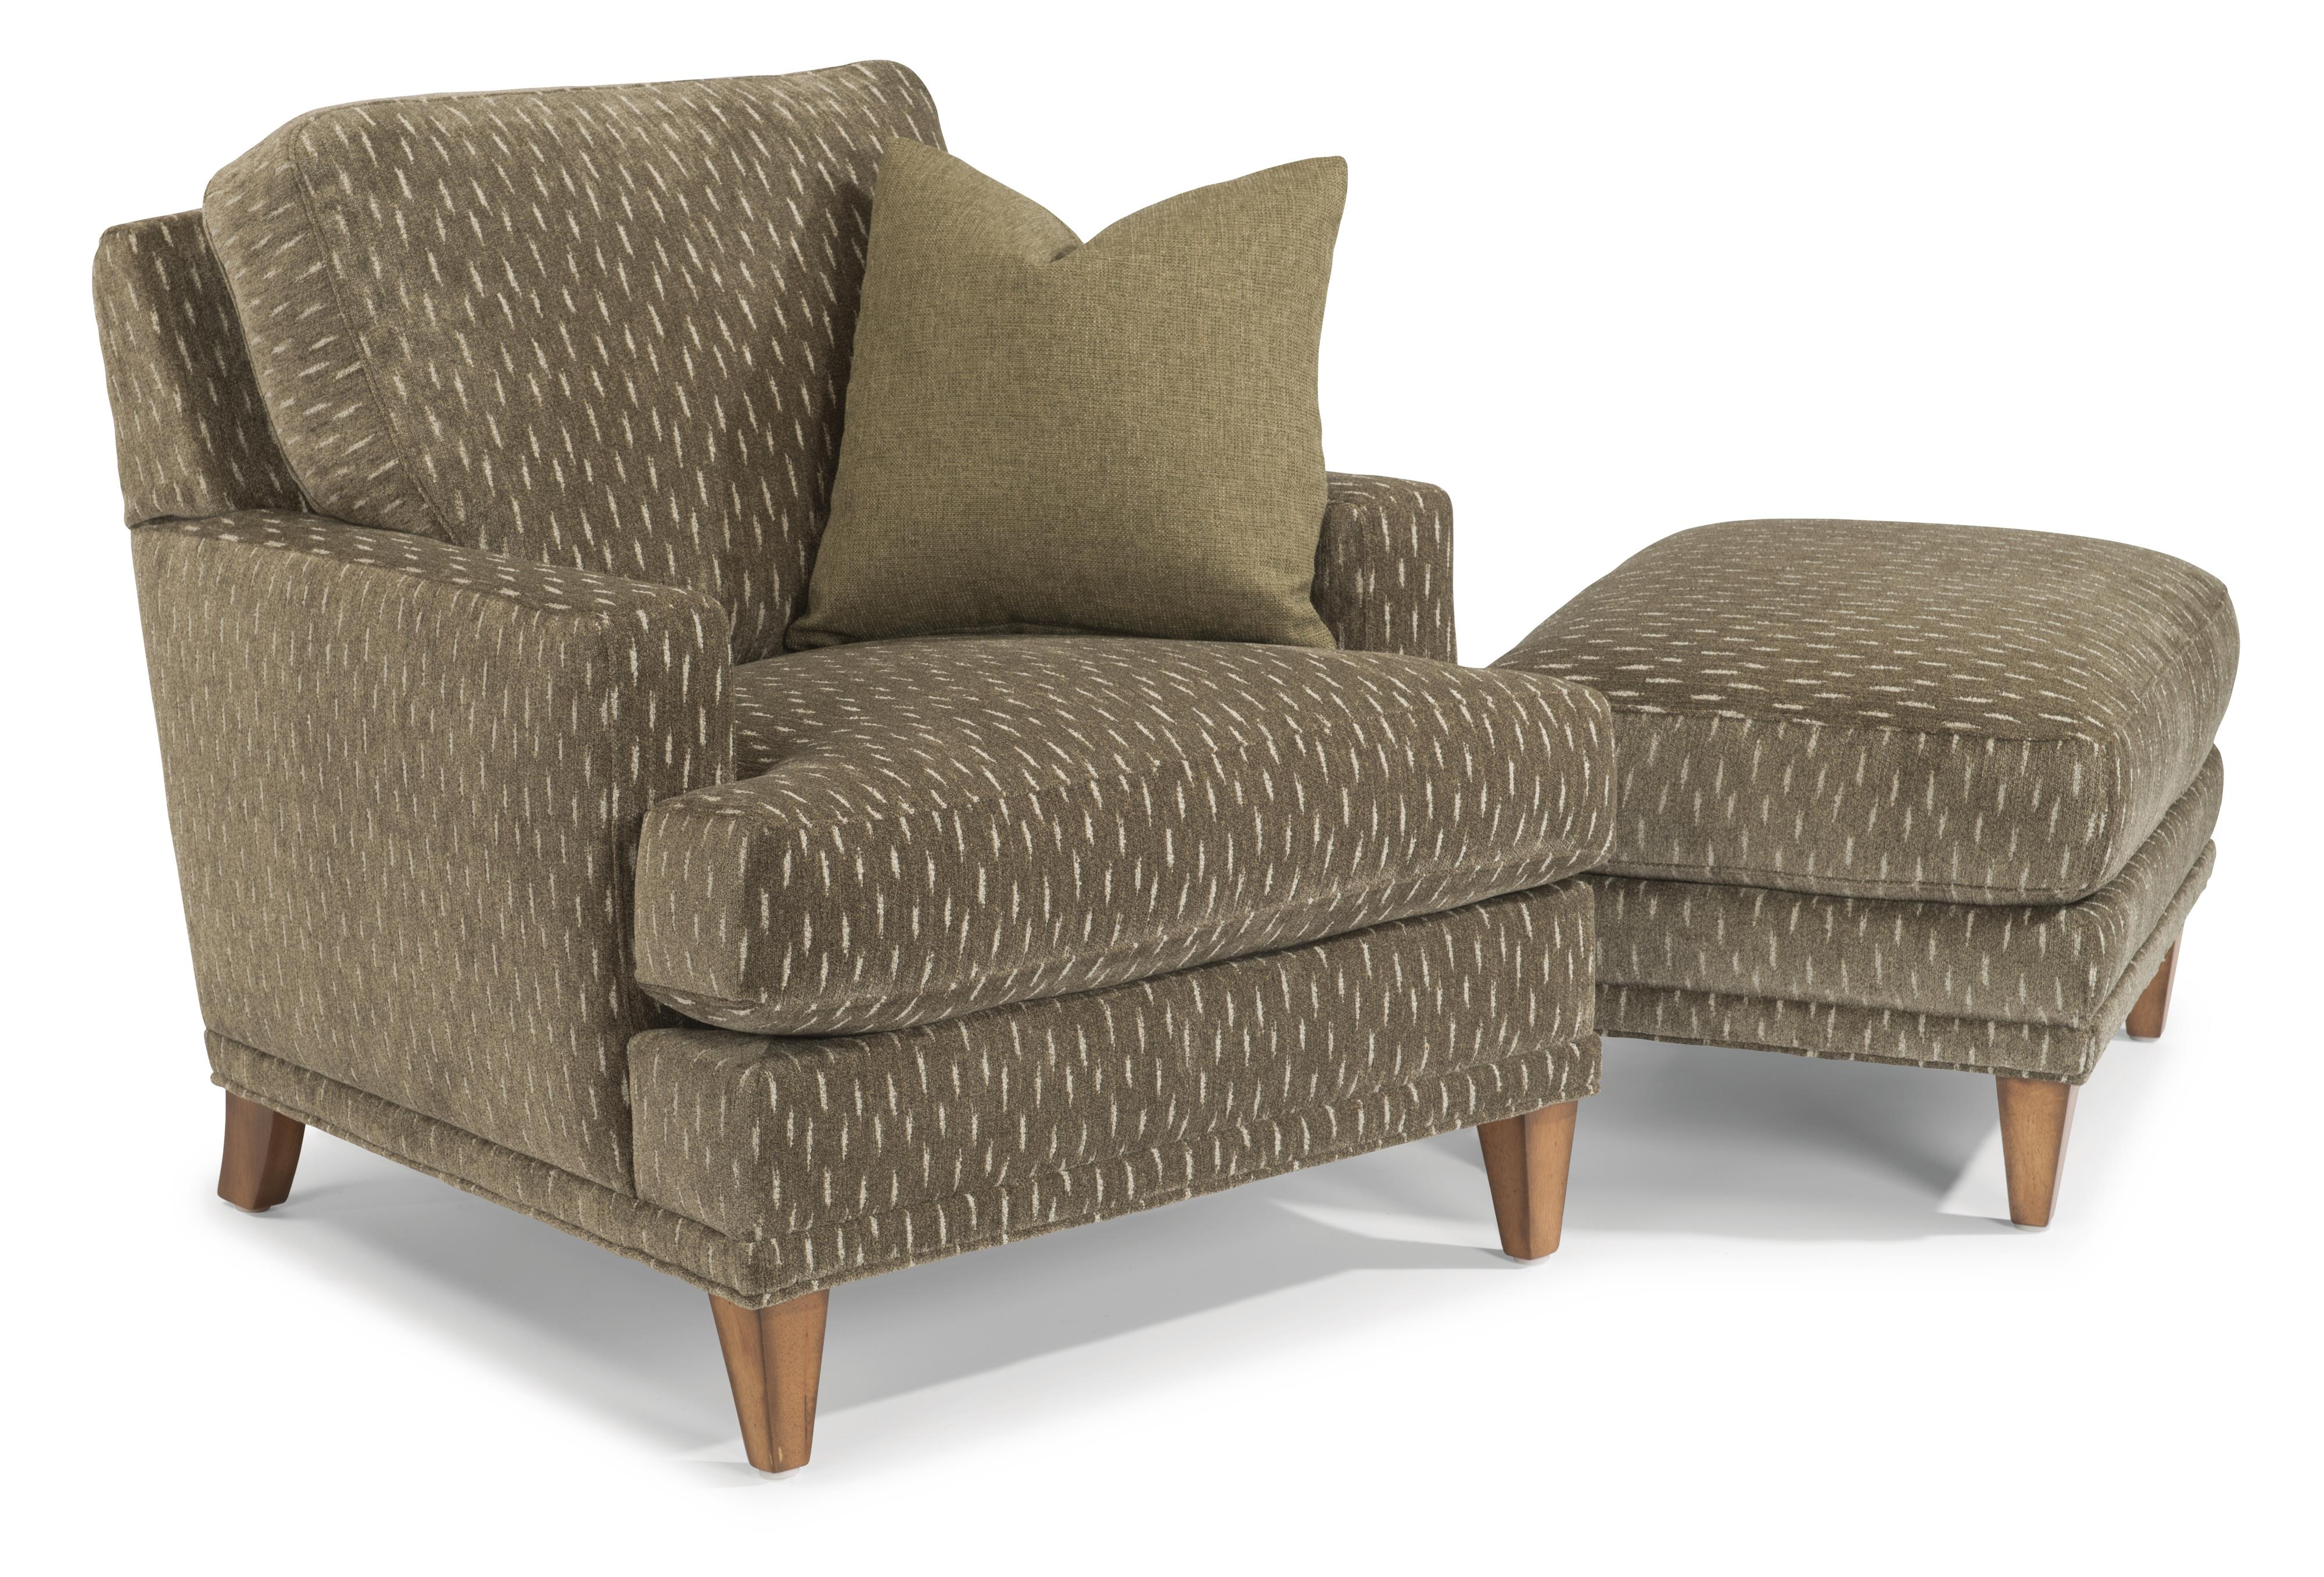 Flexsteel Ocean Chair & Ottoman Set (No Nails) - Item Number: 7368-10+7368-08-051-20